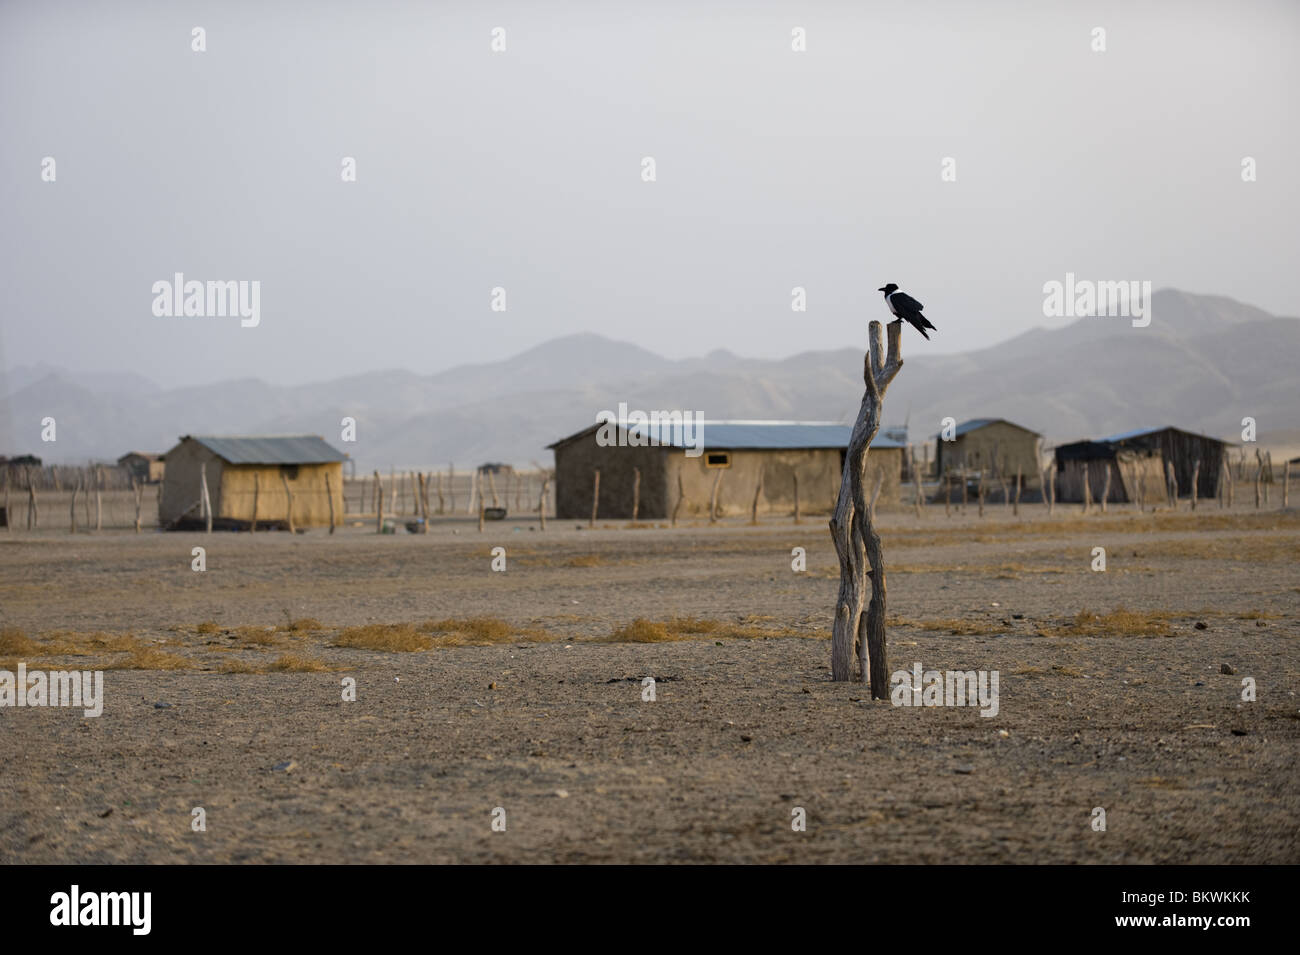 Purros vilage, Kaokoland, regione di Kunene, Namibia. Foto Stock